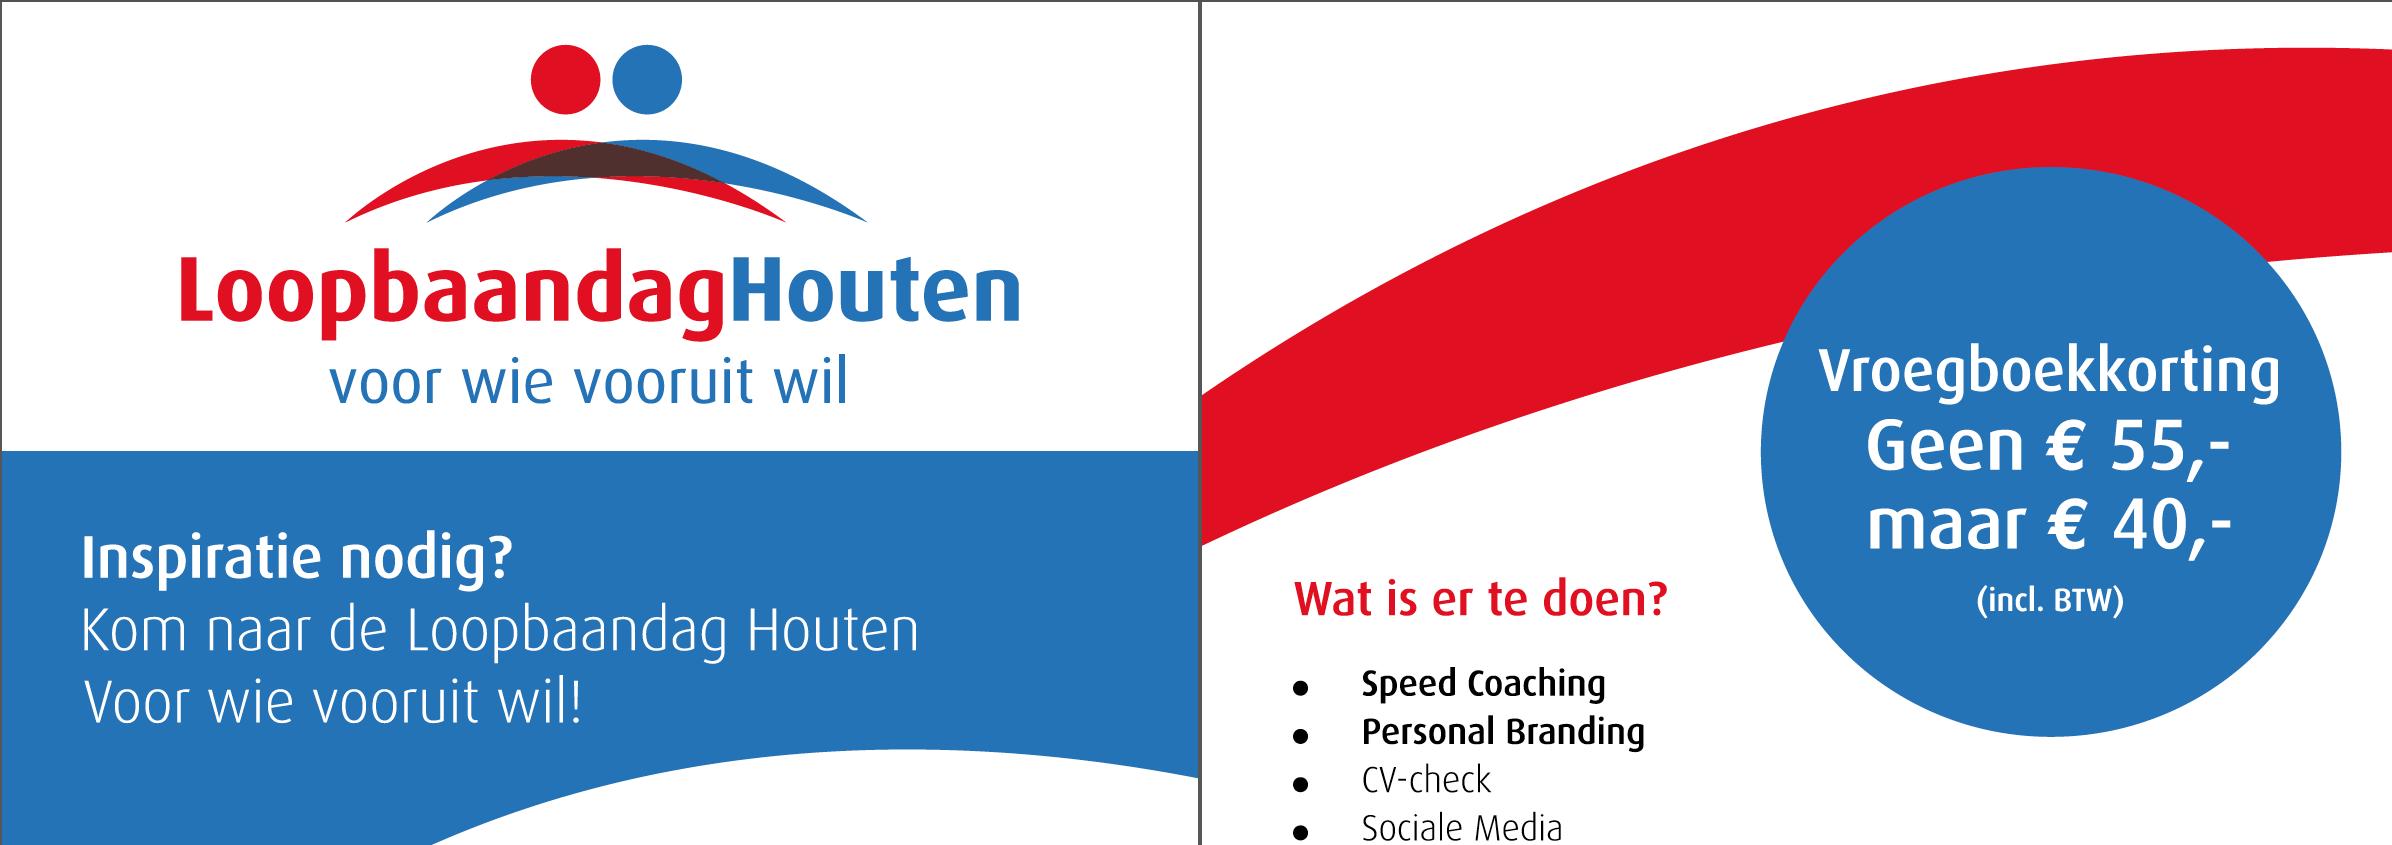 Van Essen Groep Loopbaandag Houten 2016